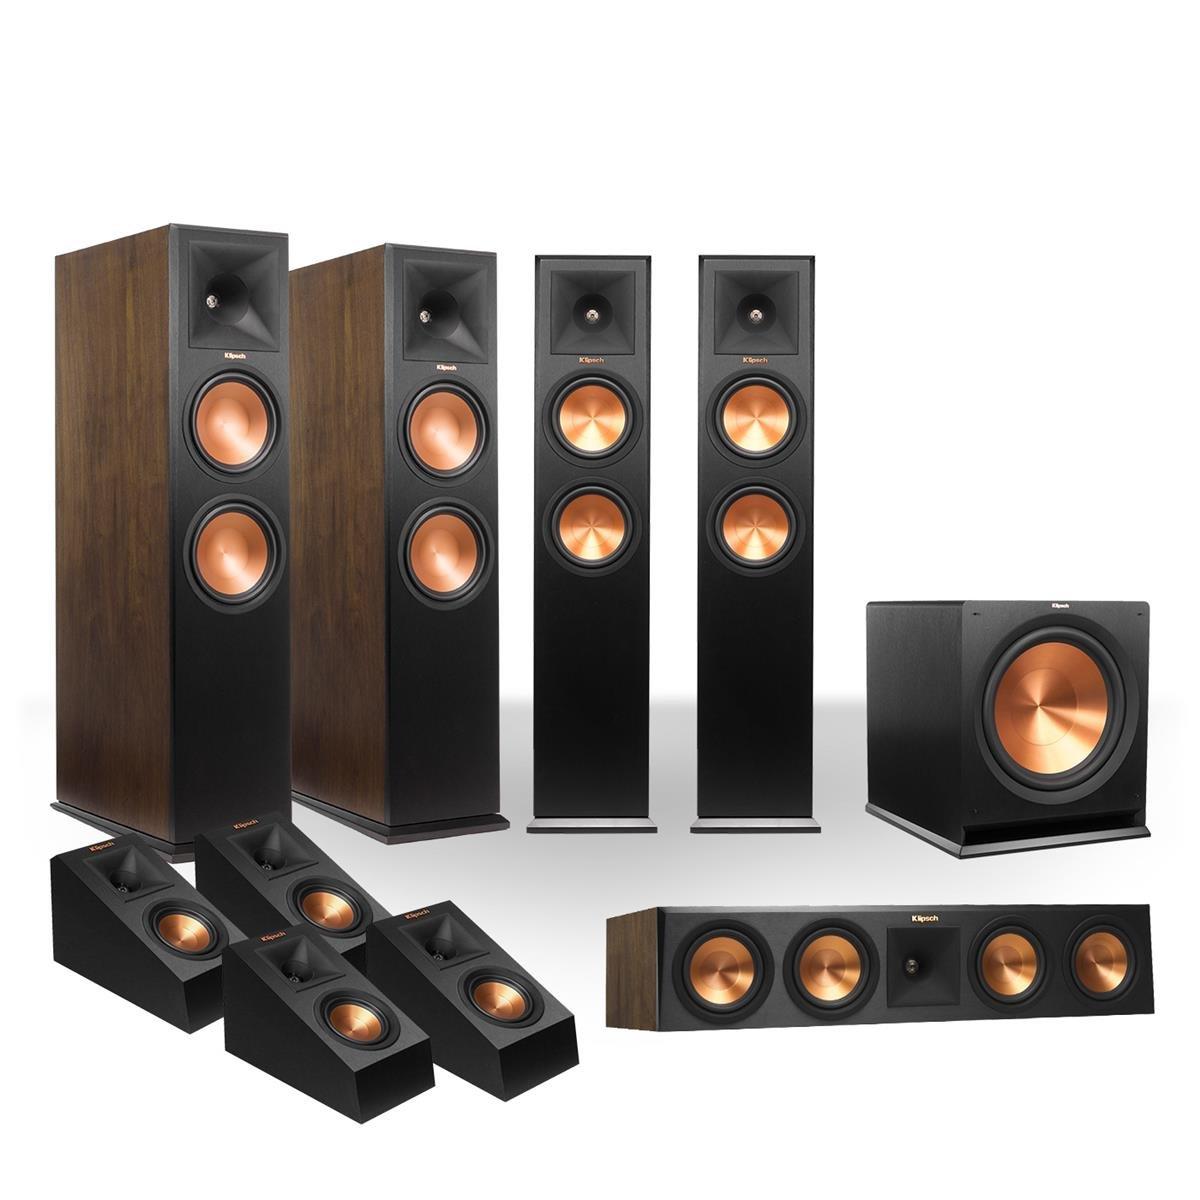 Klipsch rp-280 5.1.4 Dolby Atmosシステム(ブラック) B0189NDJBQ